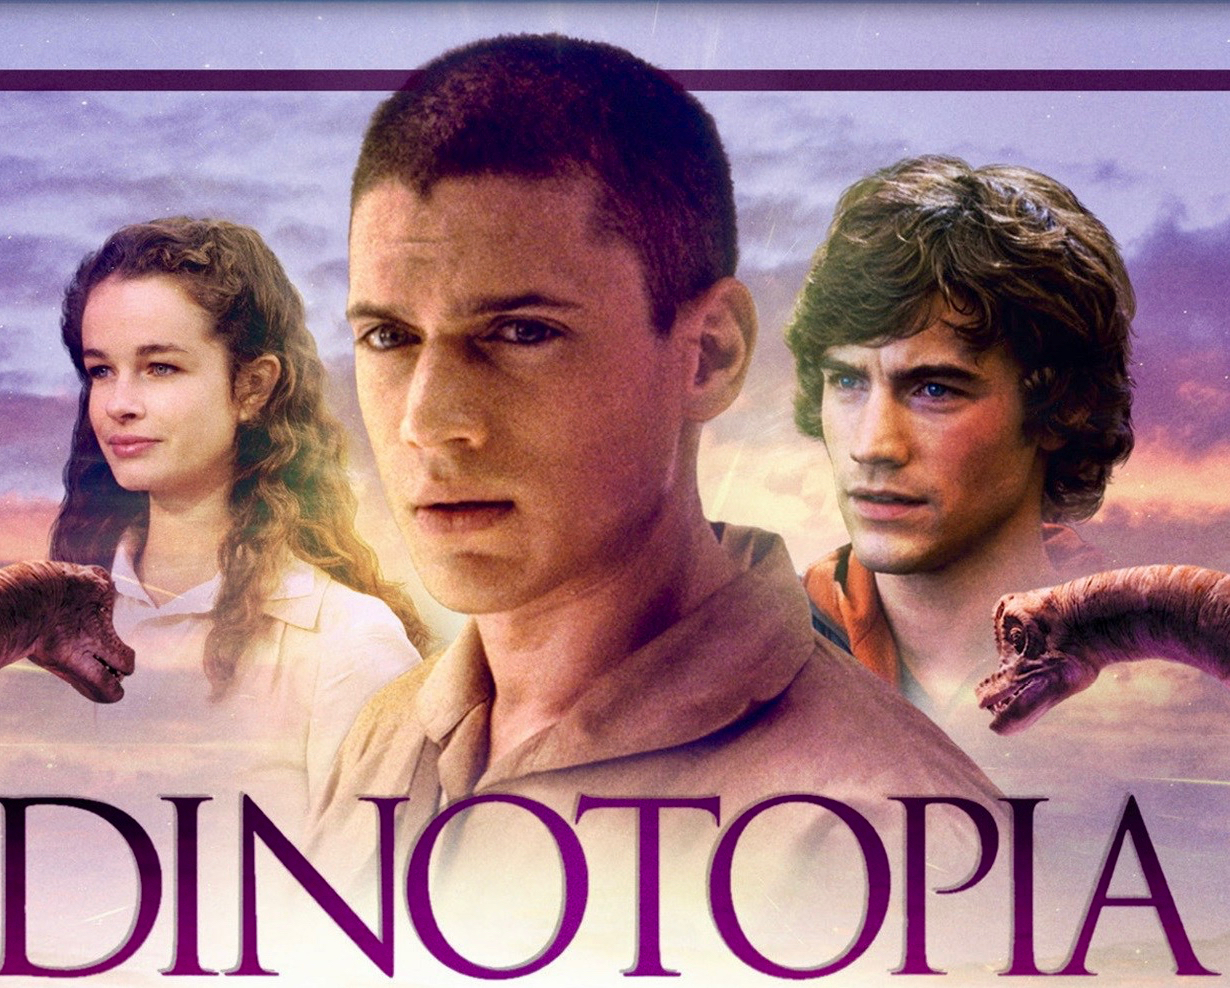 dinotopia film